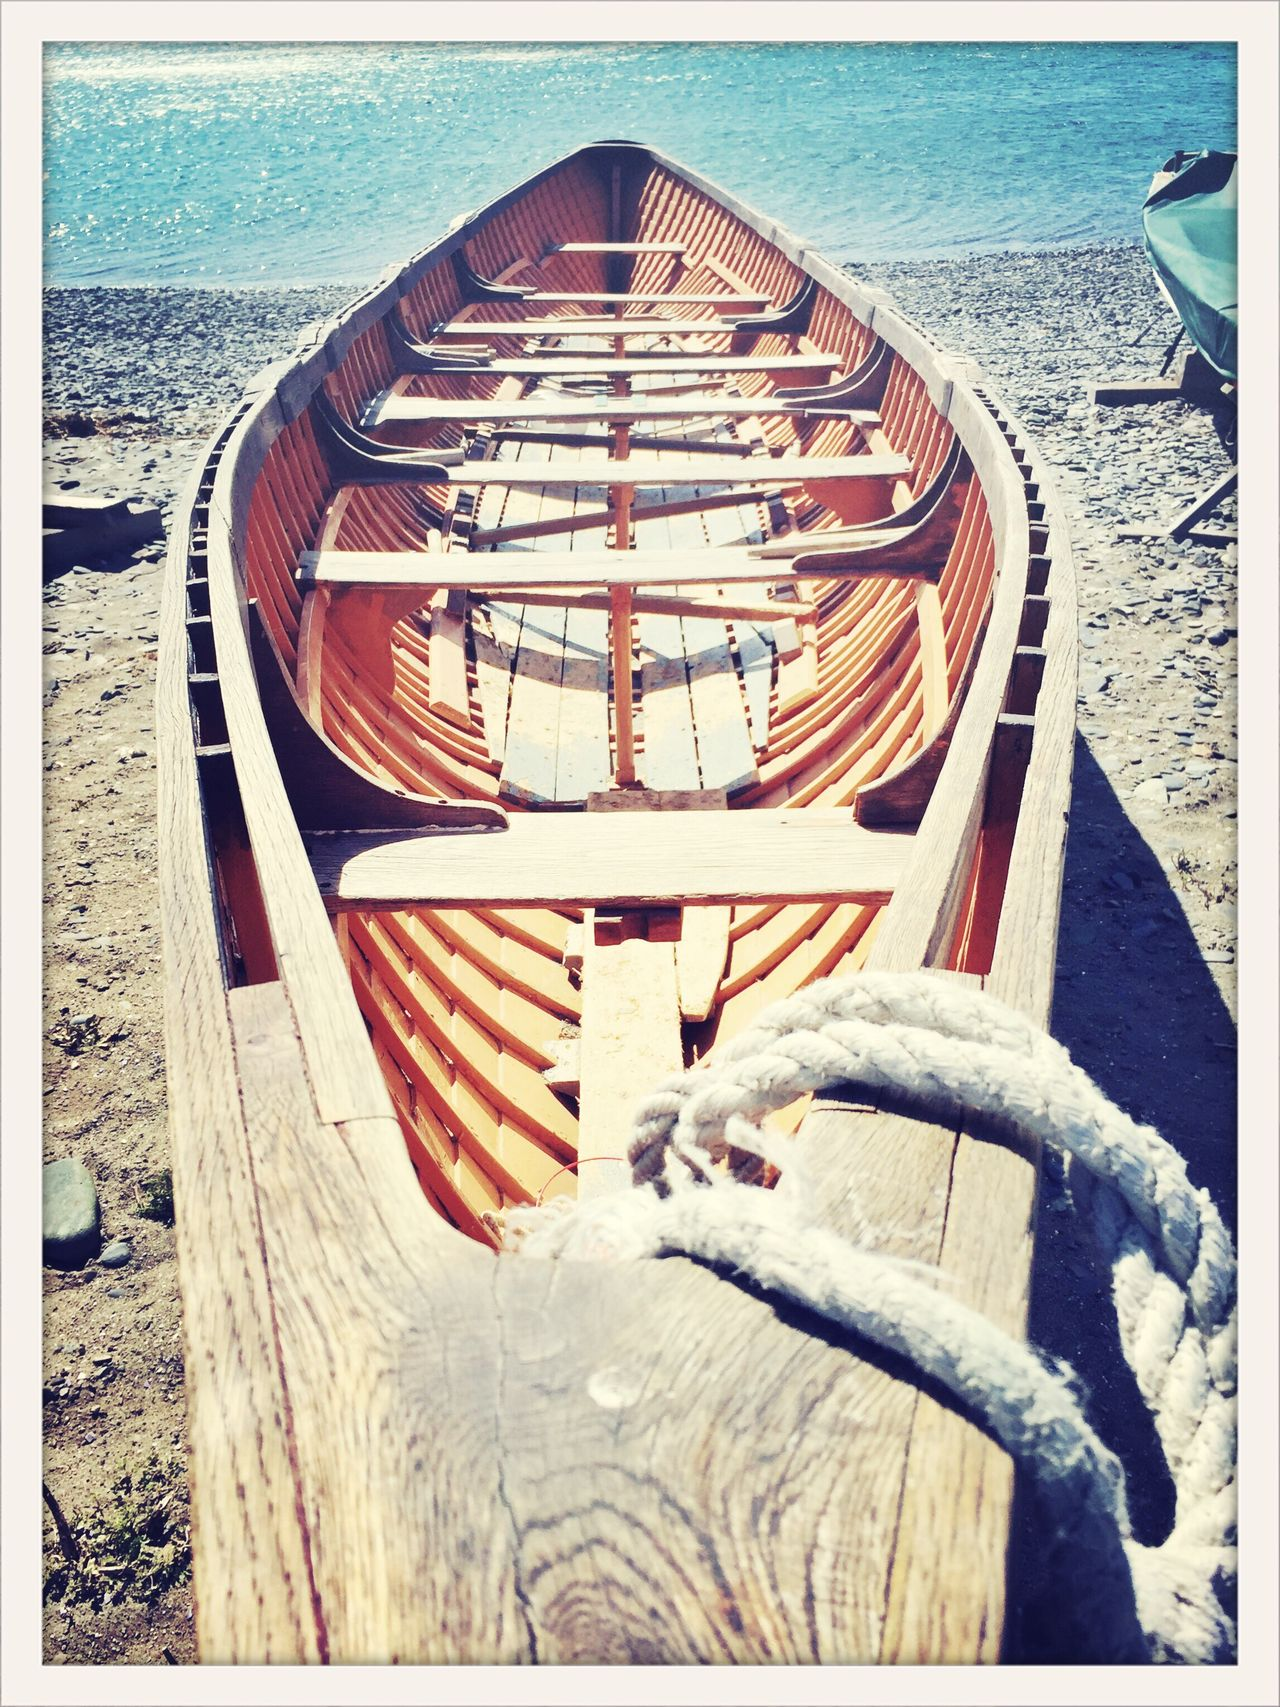 A yesteryear race Boating NEM Mood AMPt_community Best EyeEm Shot Sea Best Of EyeEm Mode Of Transport